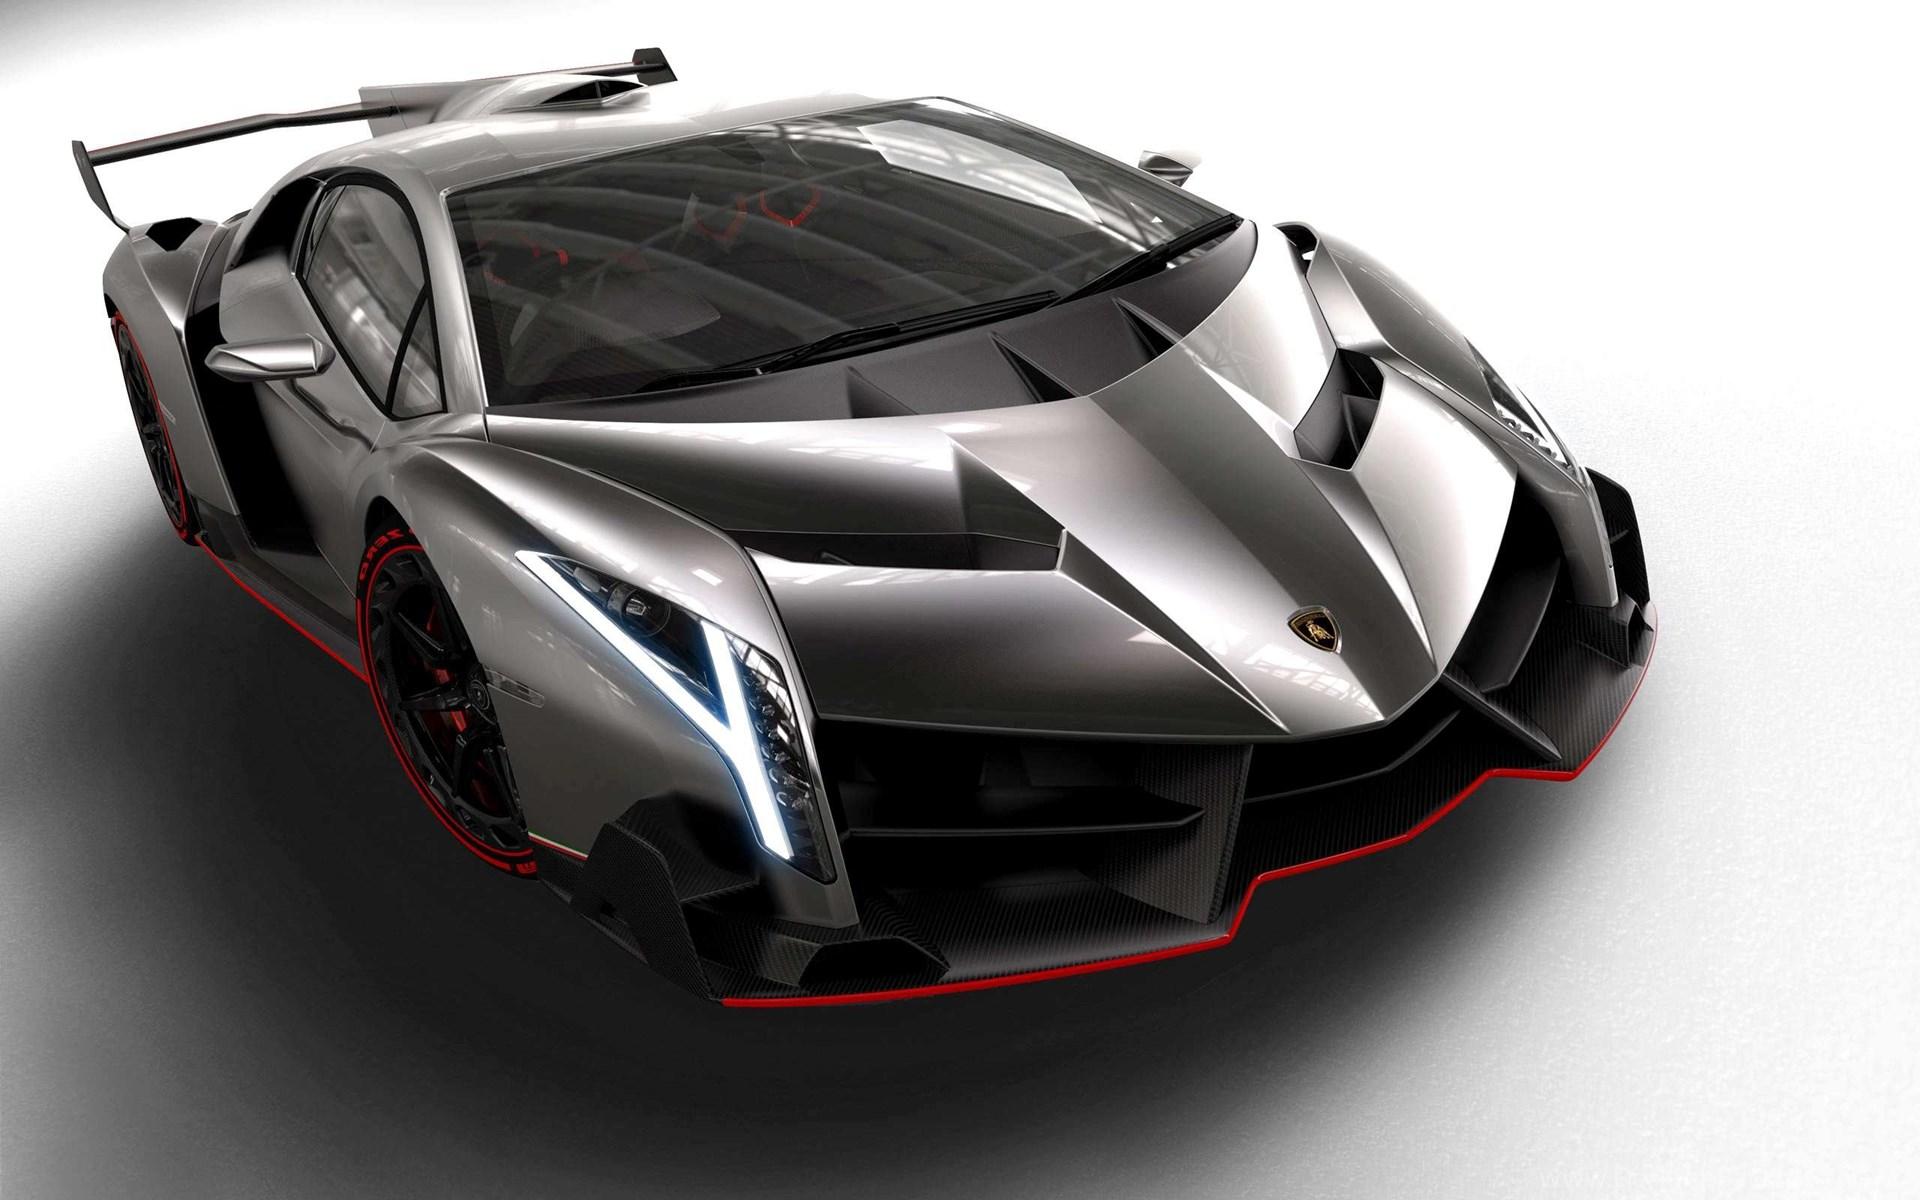 White Lamborghini Veneno Wallpapers Image Desktop Background